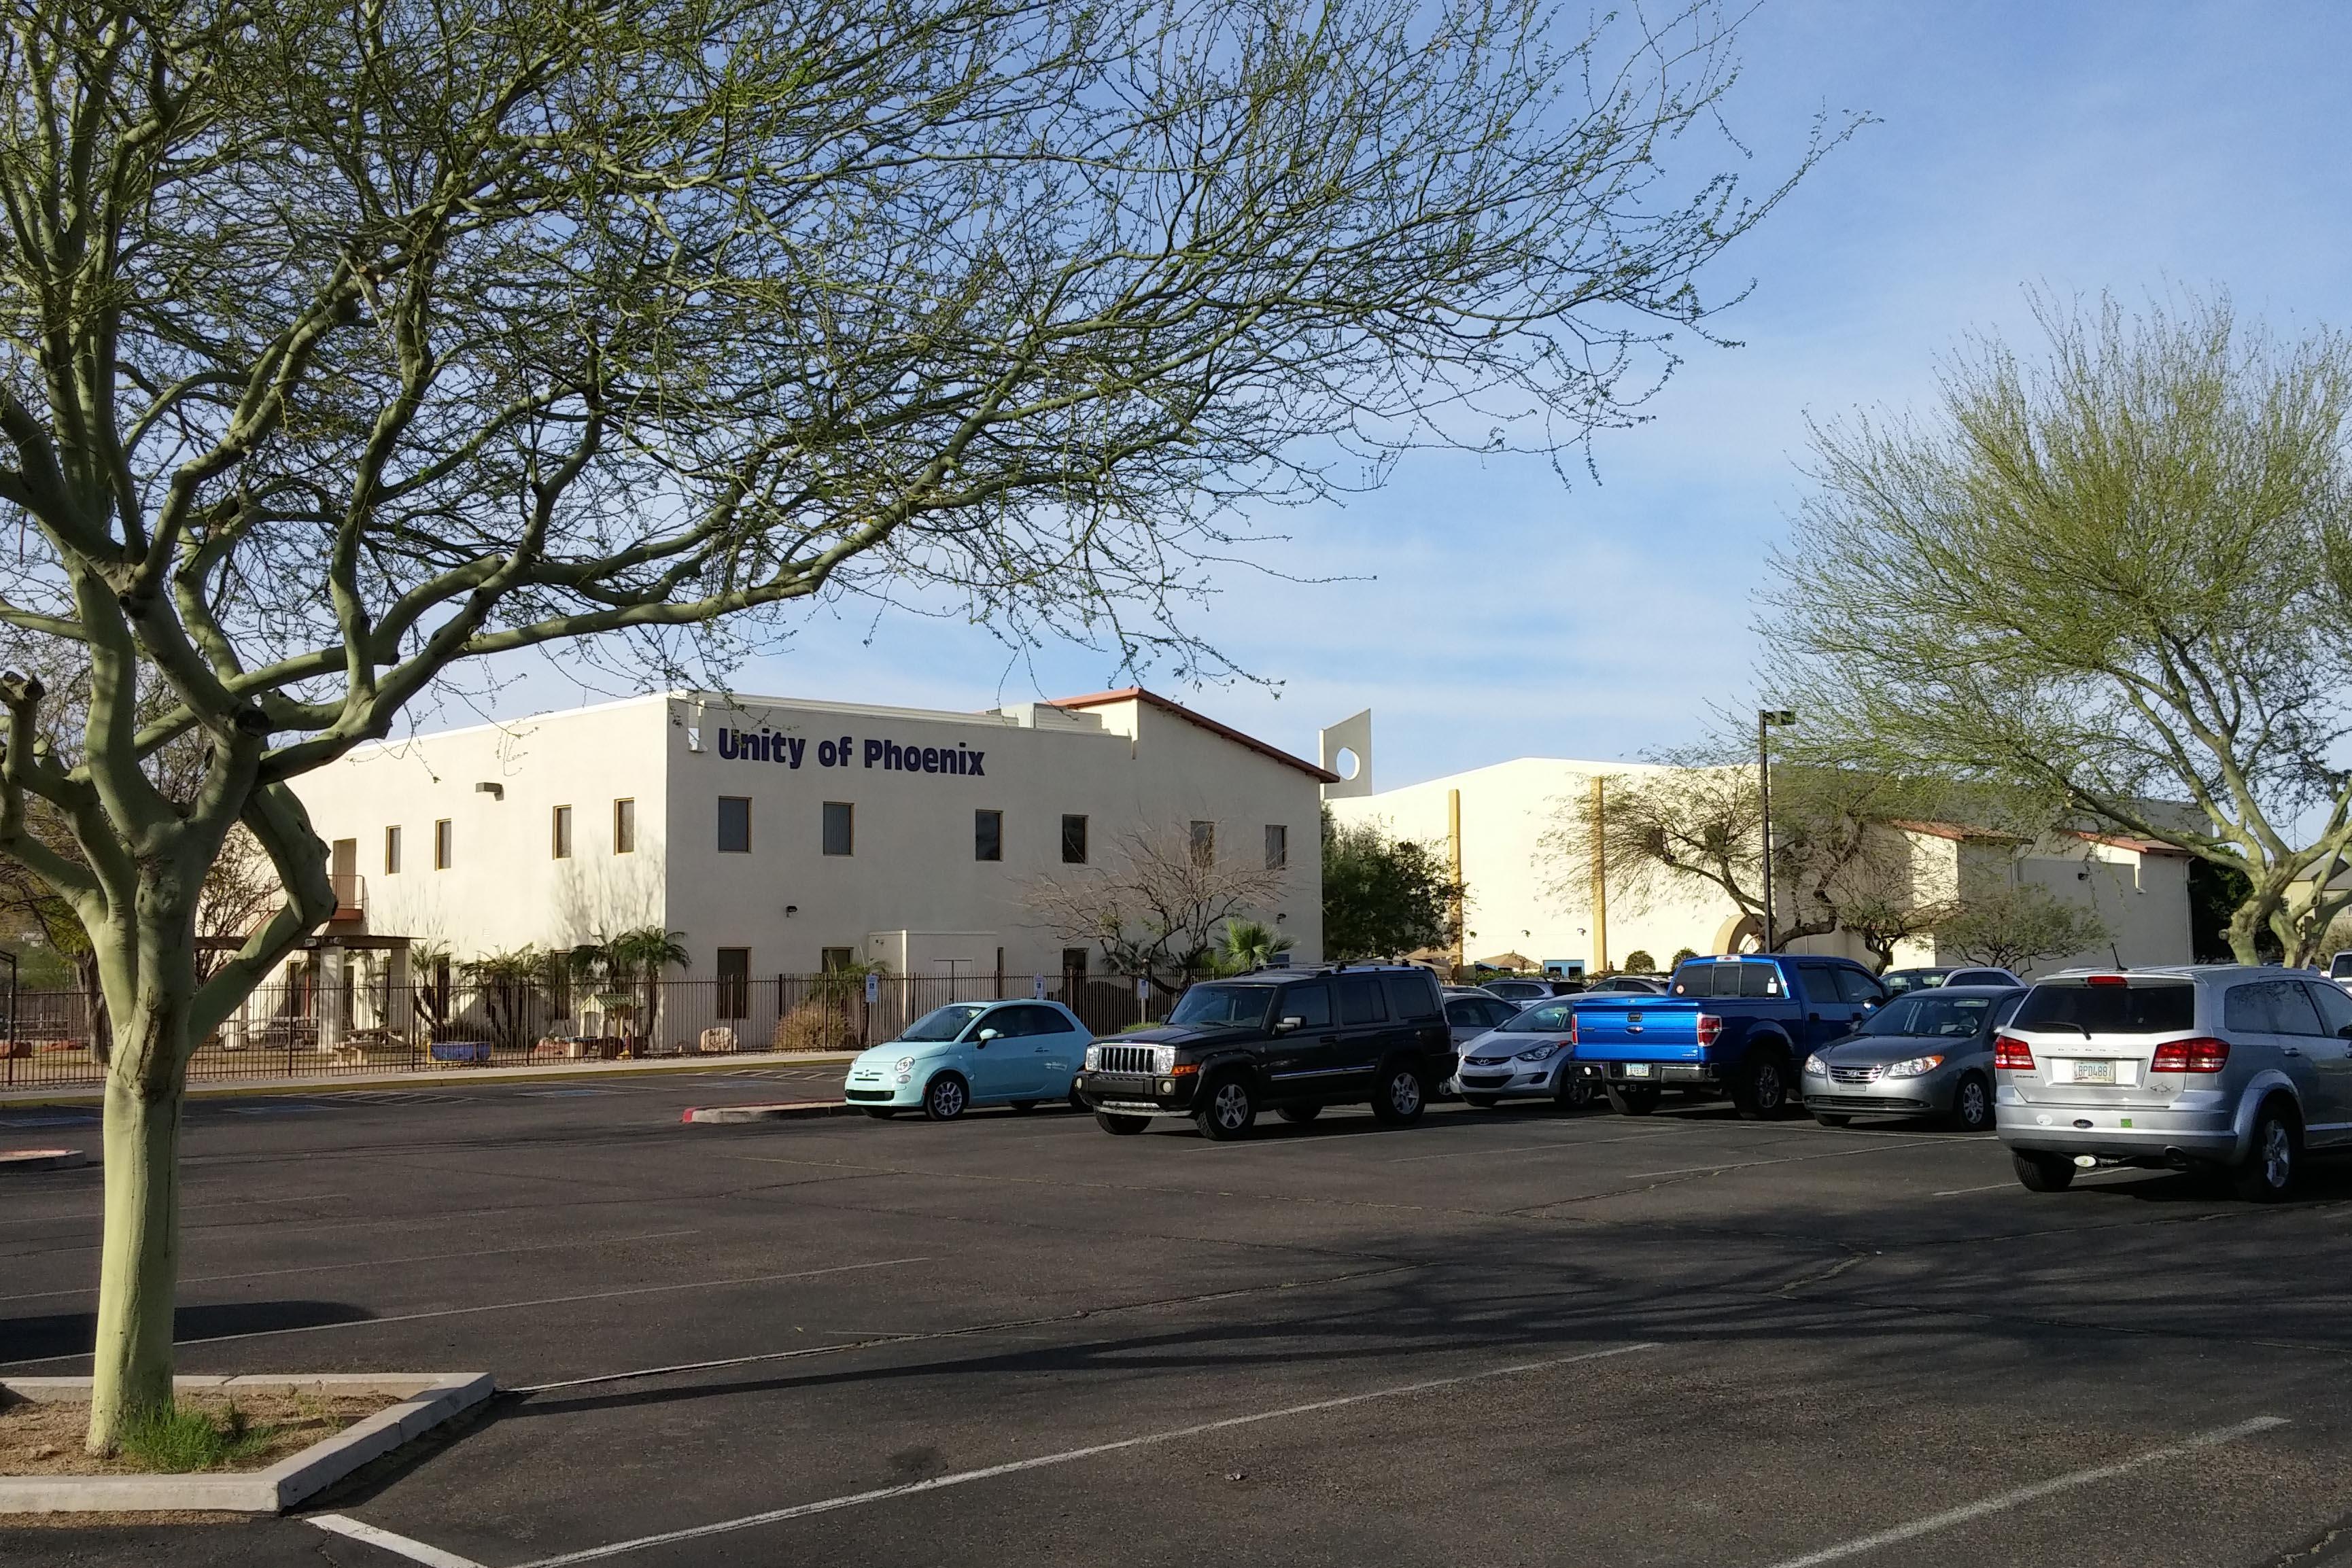 Unity Spiritual Center, Phoenix, AZ (Exterior)